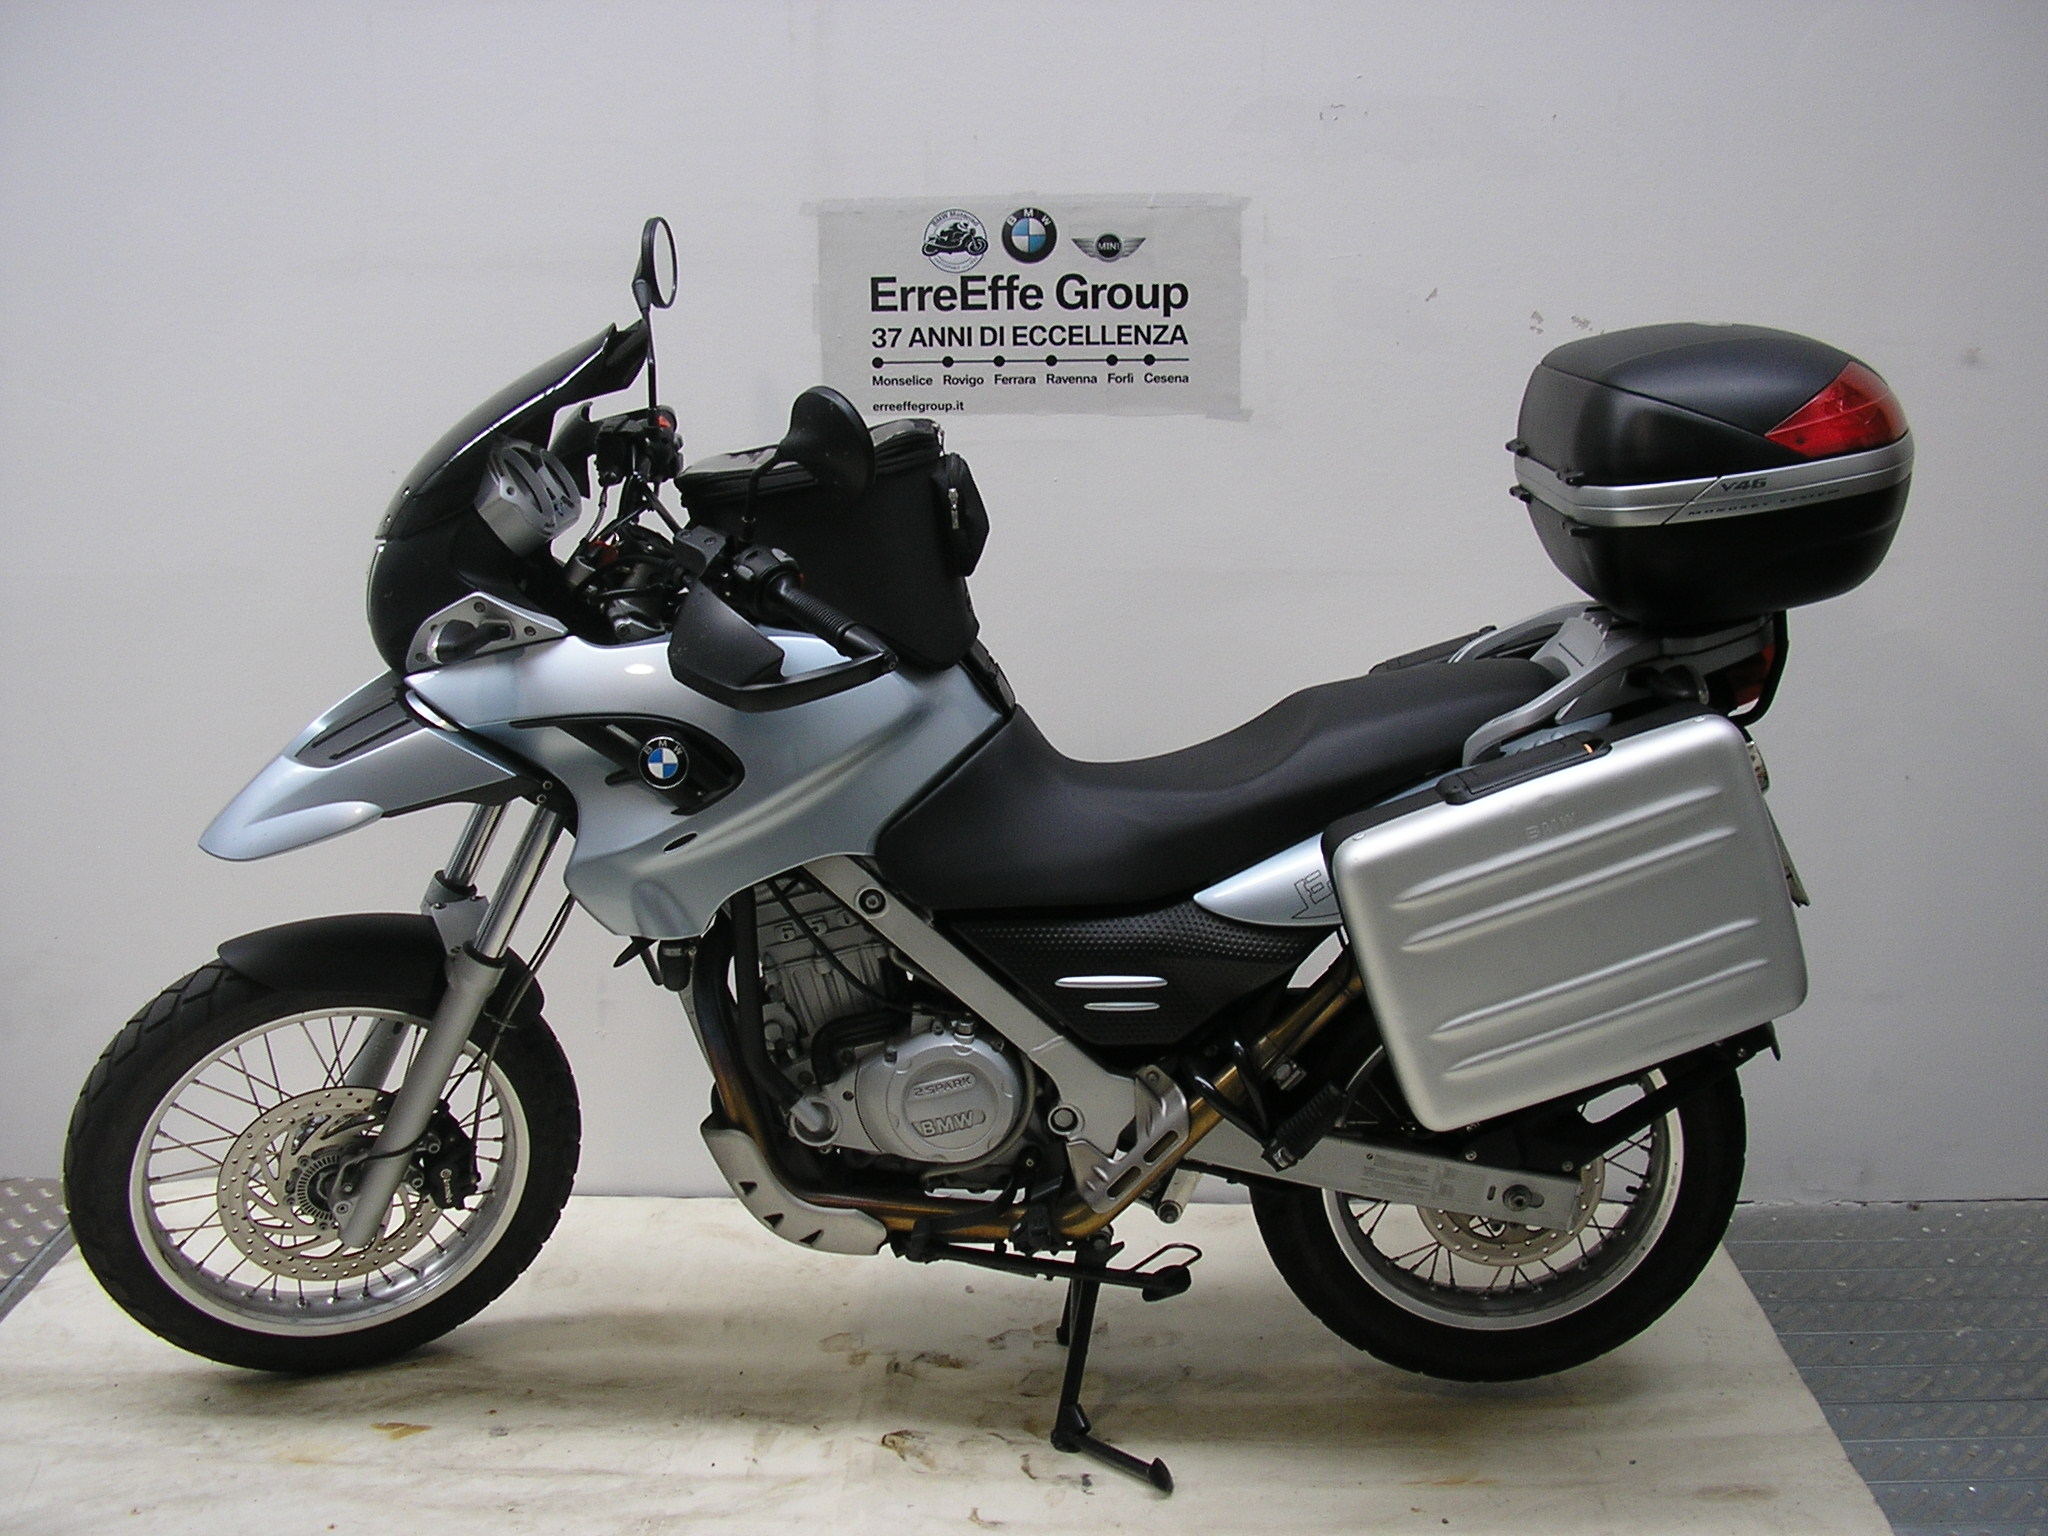 erreeffegroup spa - concessionaria bmw, bmw motorrad, mini